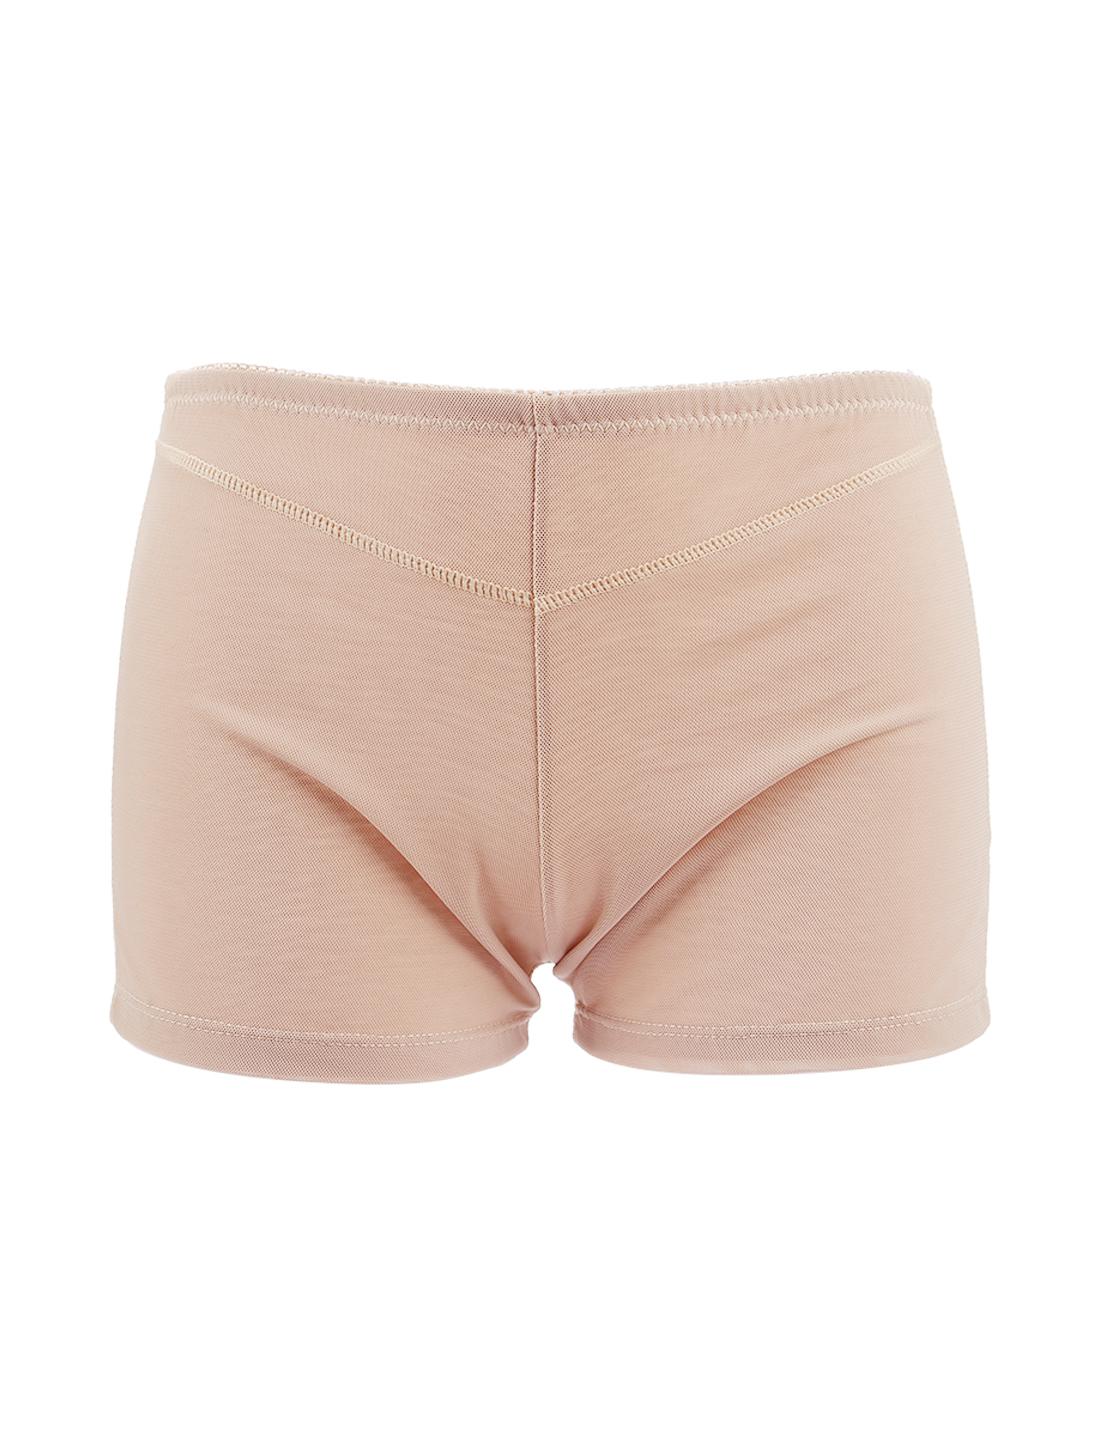 Women Butt Lifter Tummy Control Shapewear Enhancer Boyshort Underwear Beige XXX-Large